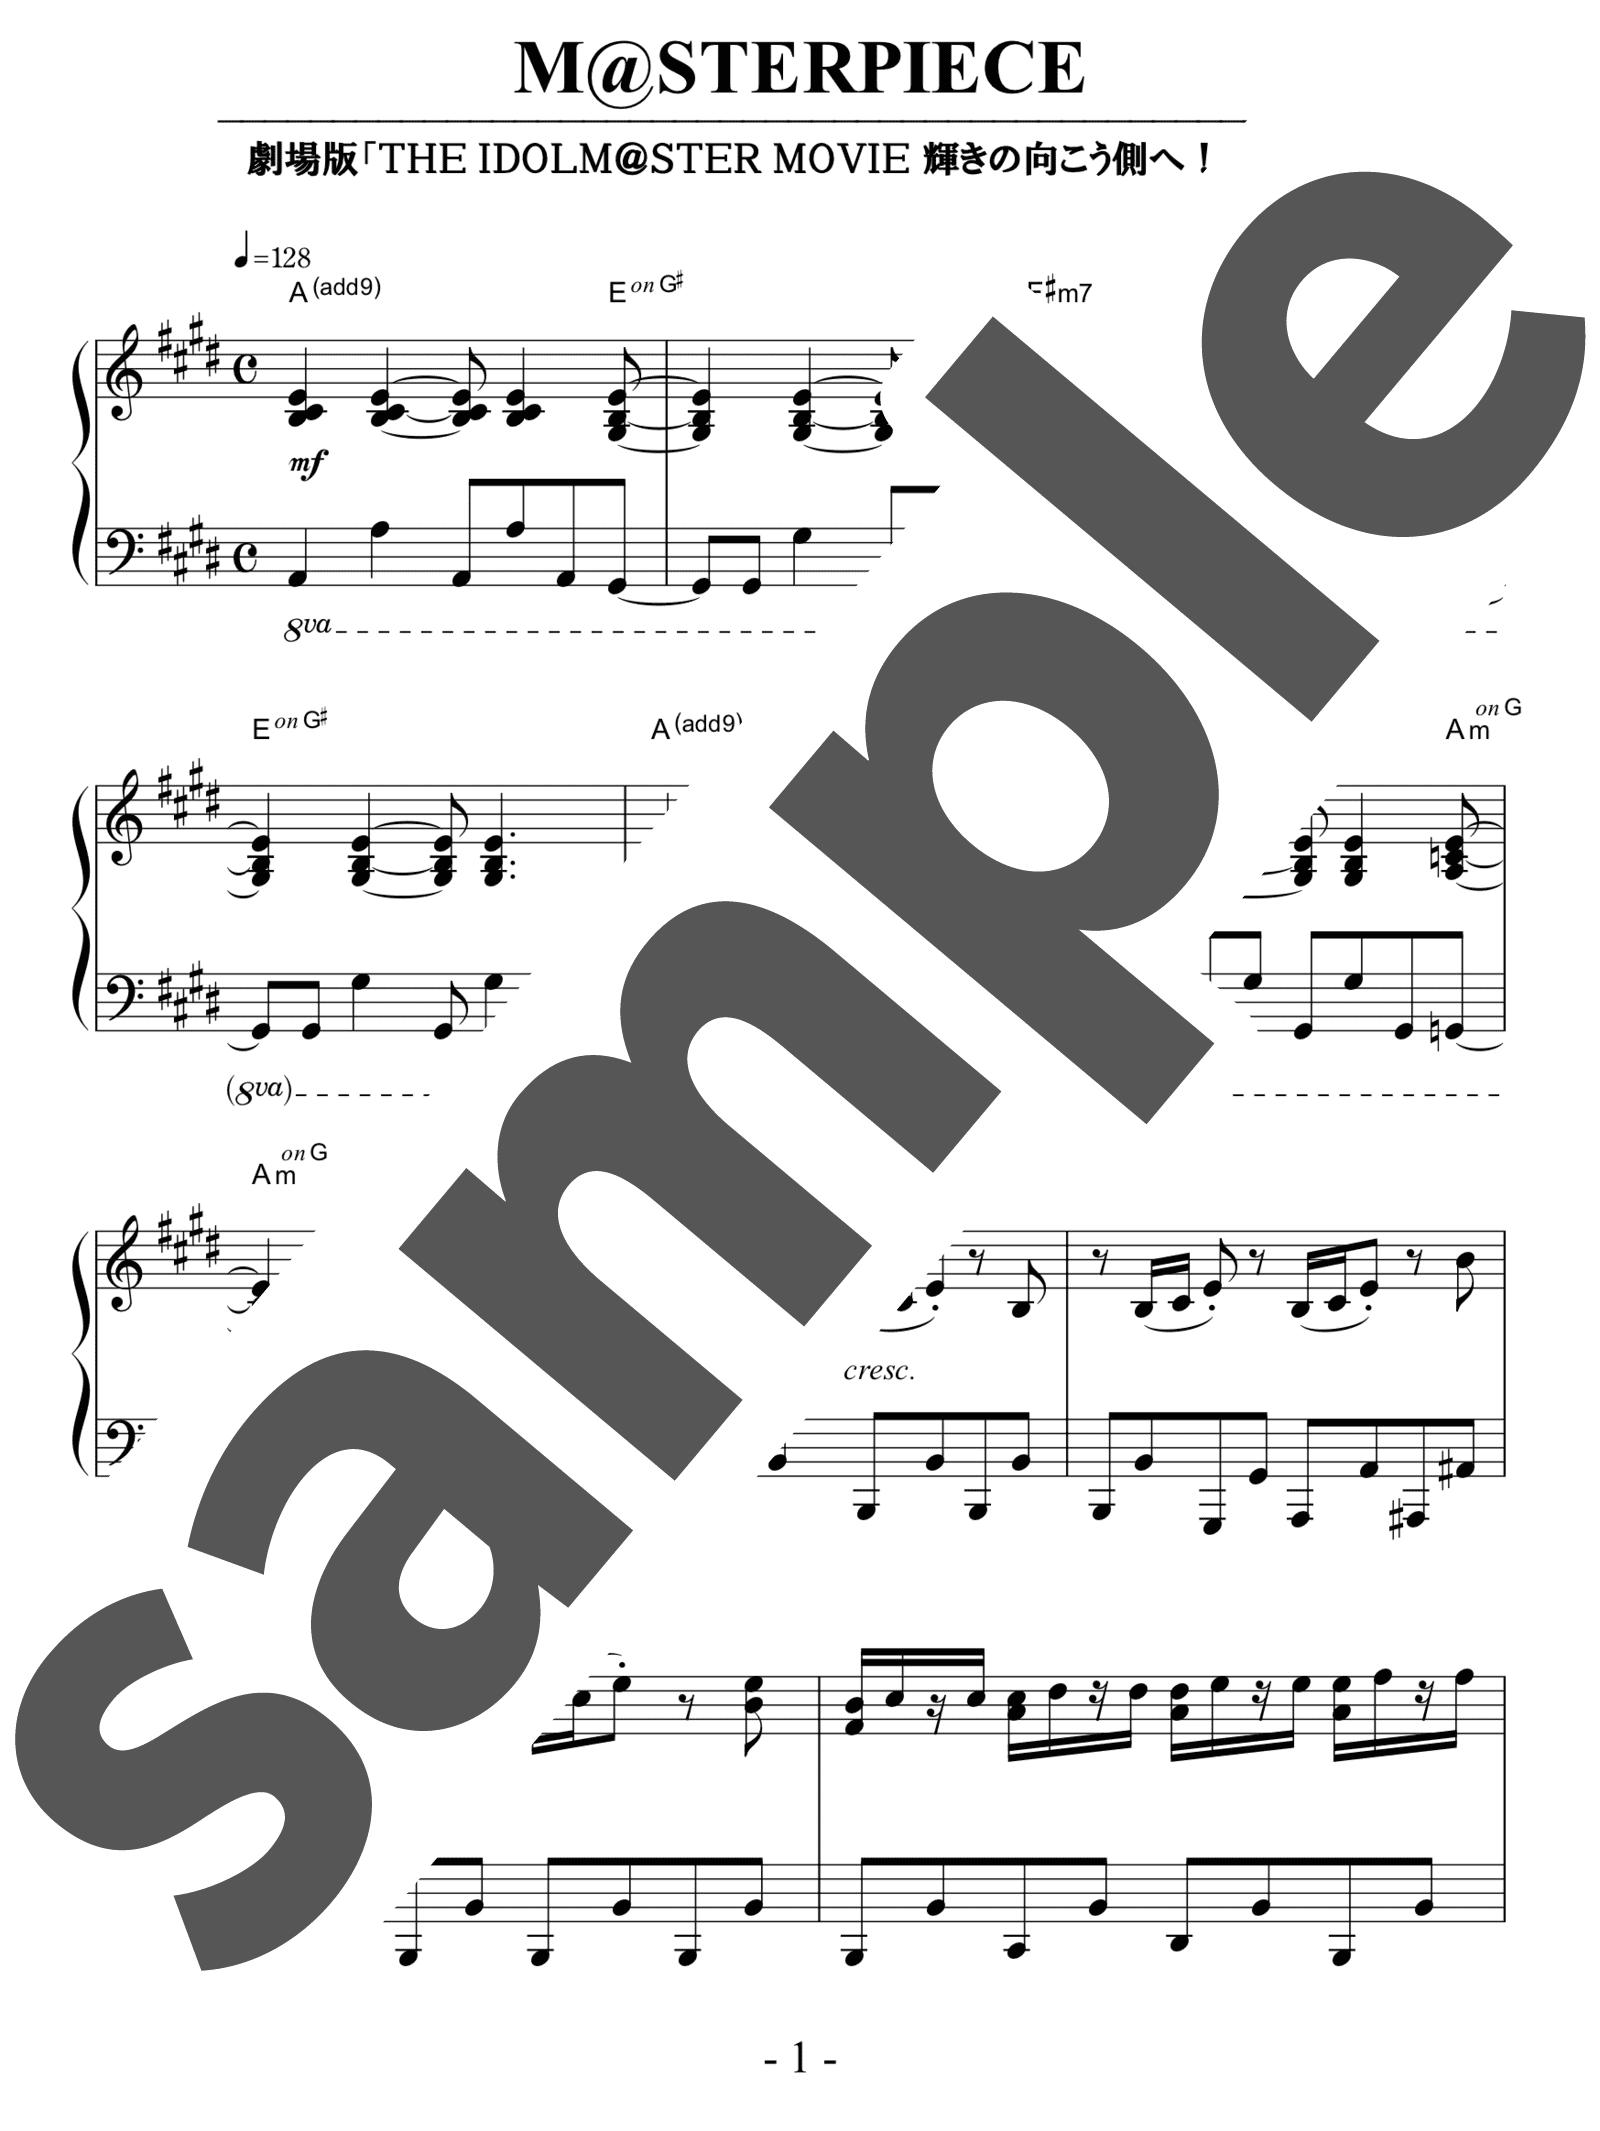 「M@STERPIECE」のサンプル楽譜